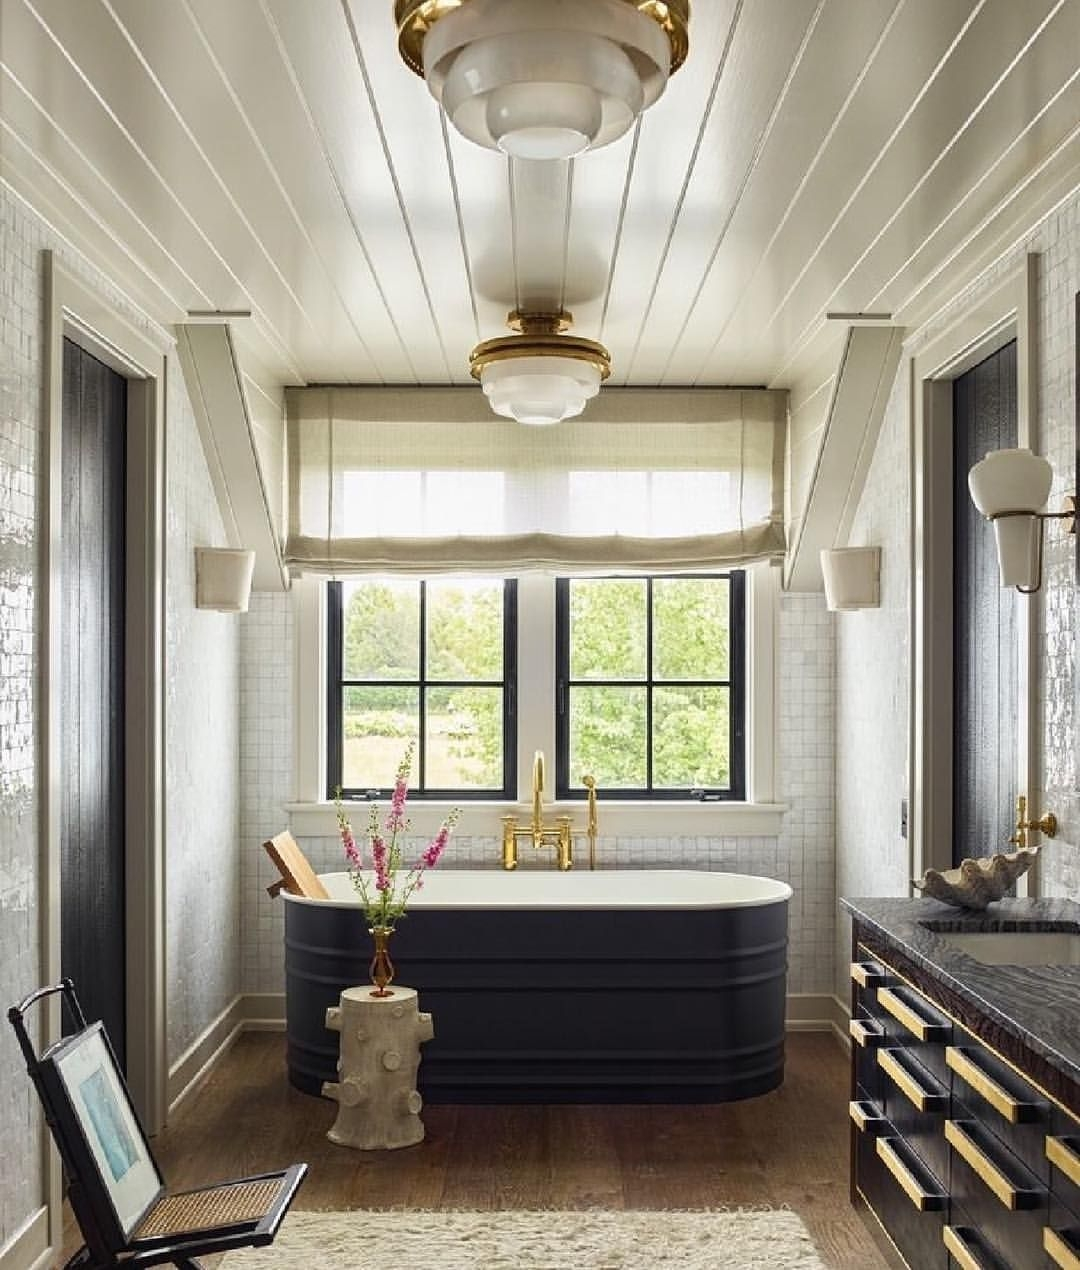 Luxury Black And White Bathroom Design Ideas 06